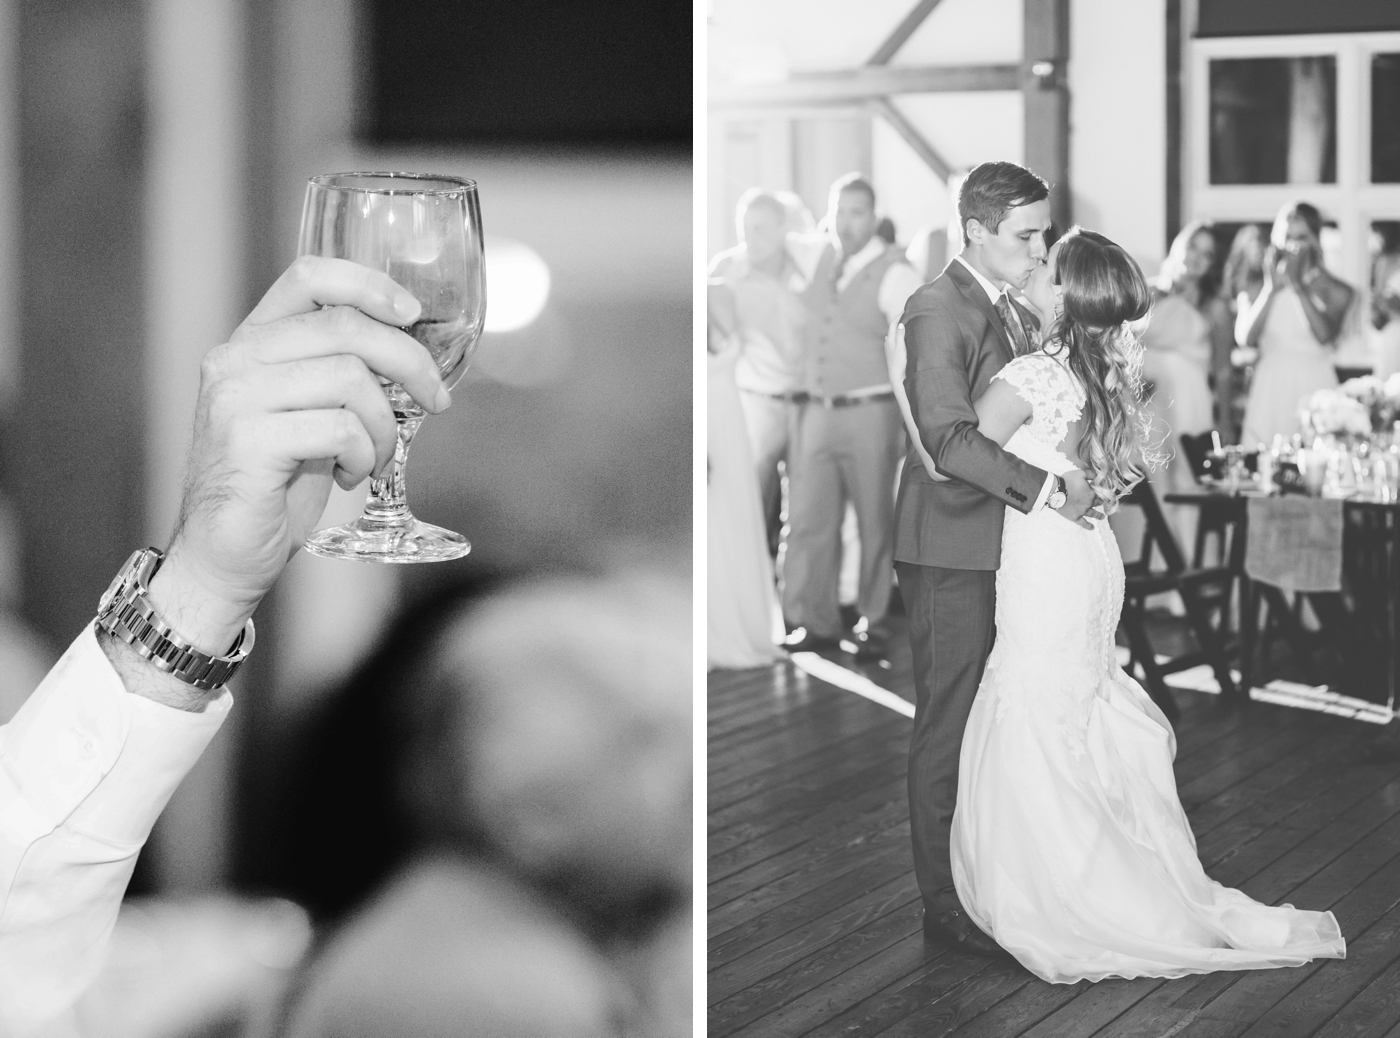 chicago-fine-art-wedding-photography-chiapetta44